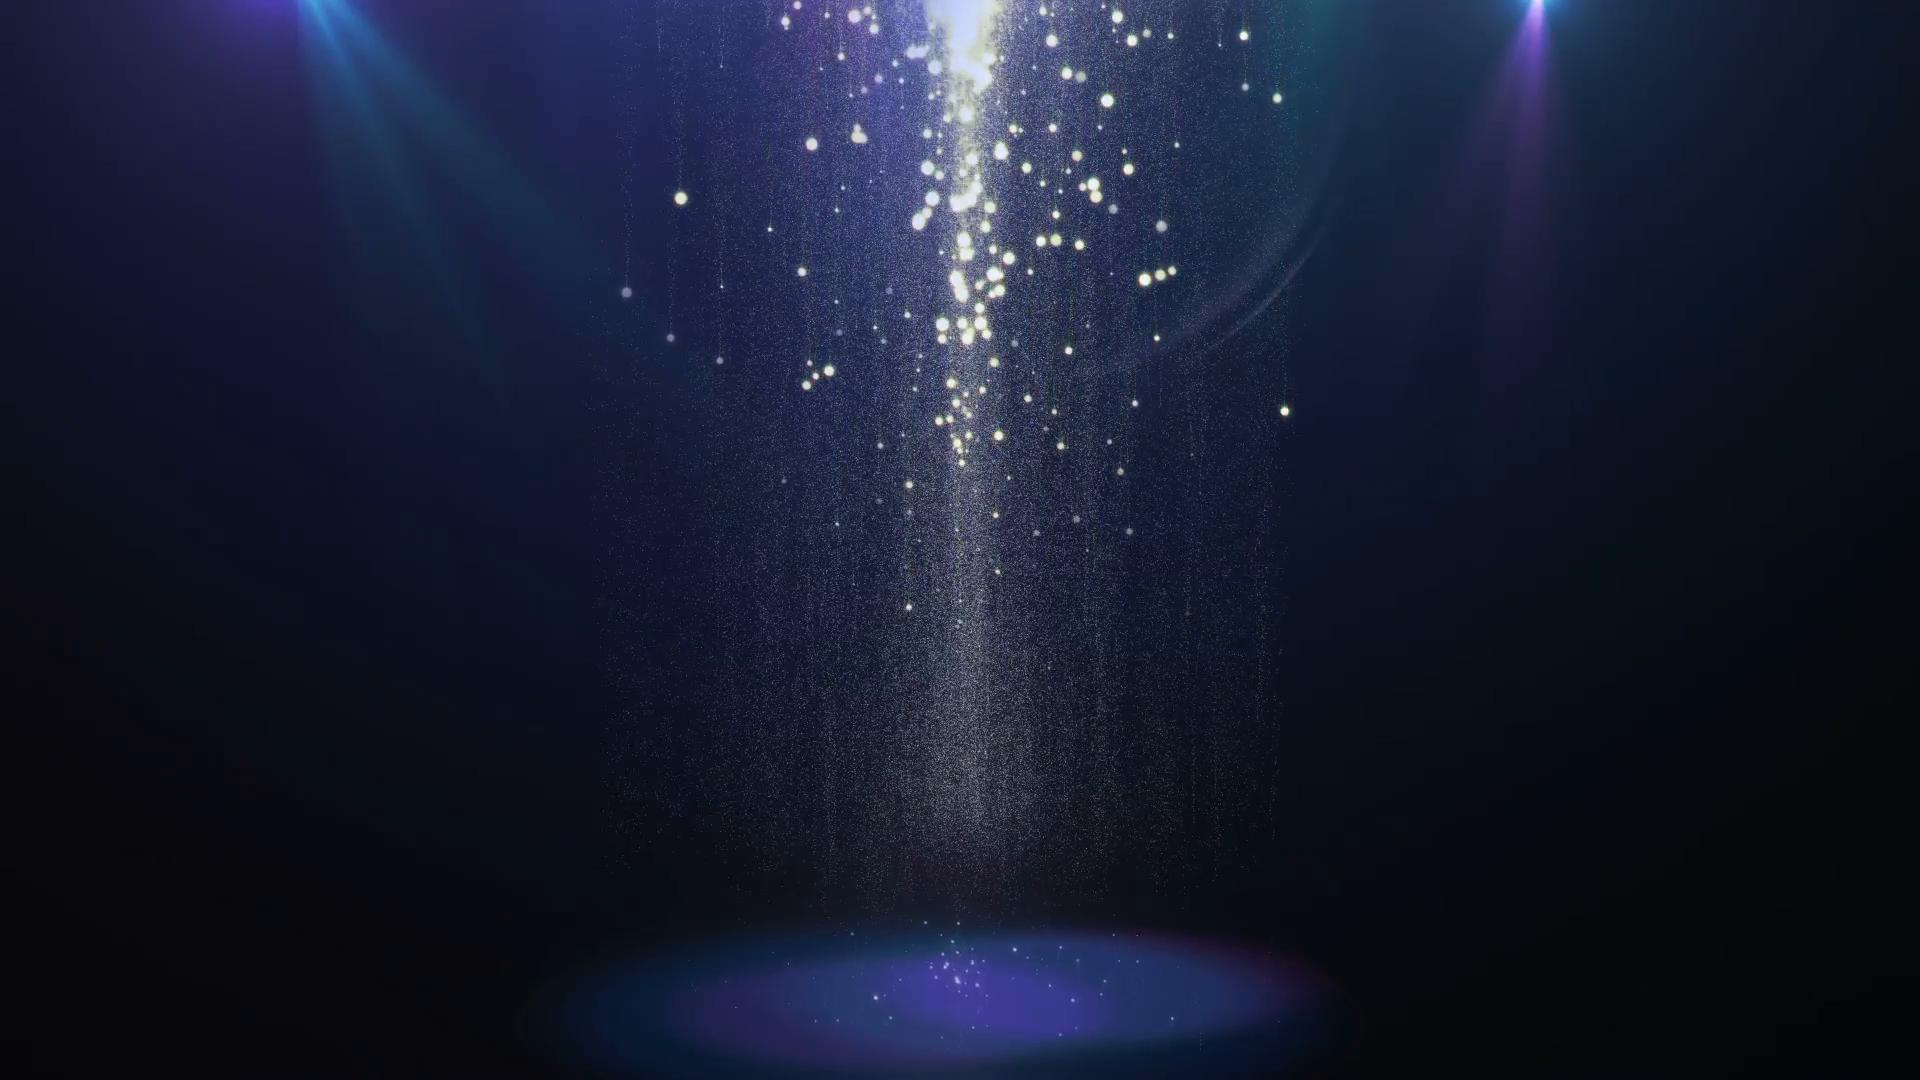 Light Effect Backgrounds